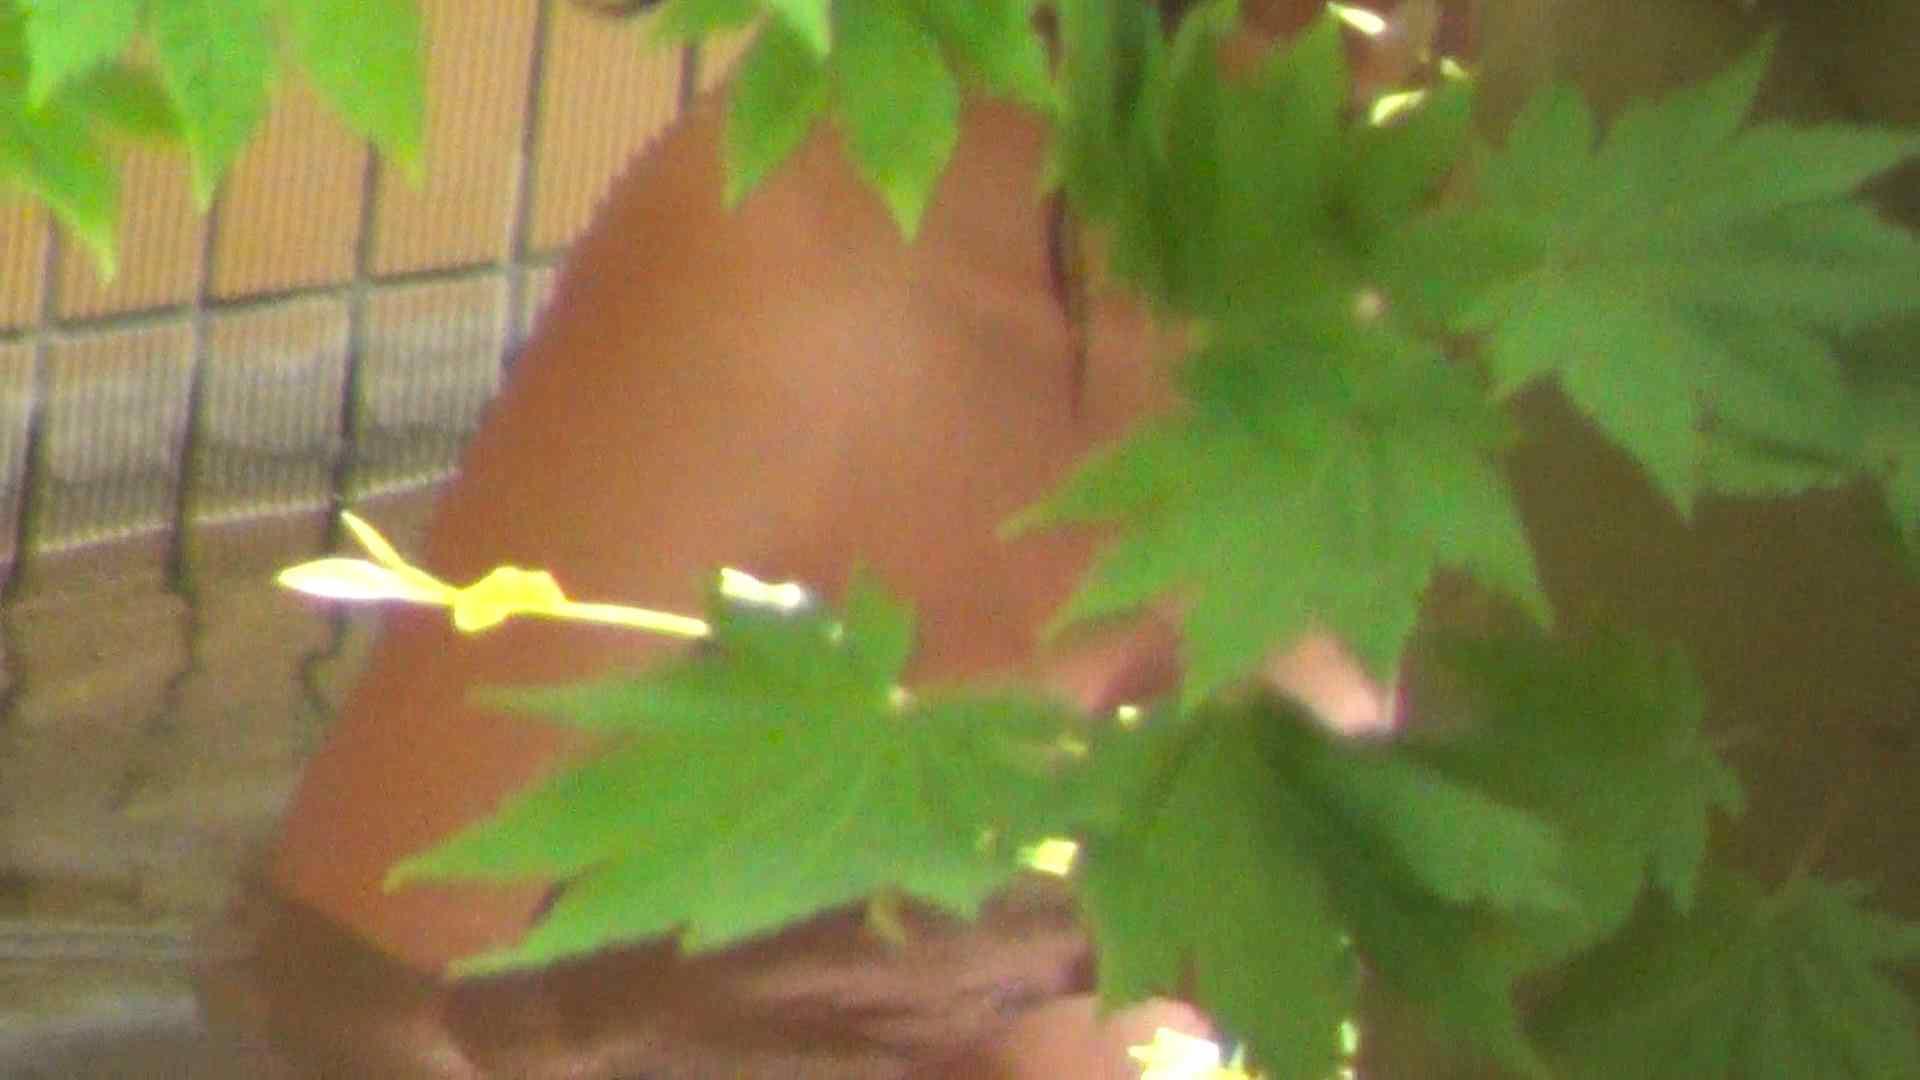 Vol.30 品のある美女 タオルと葉が憎い 美乳 戯れ無修正画像 78画像 28